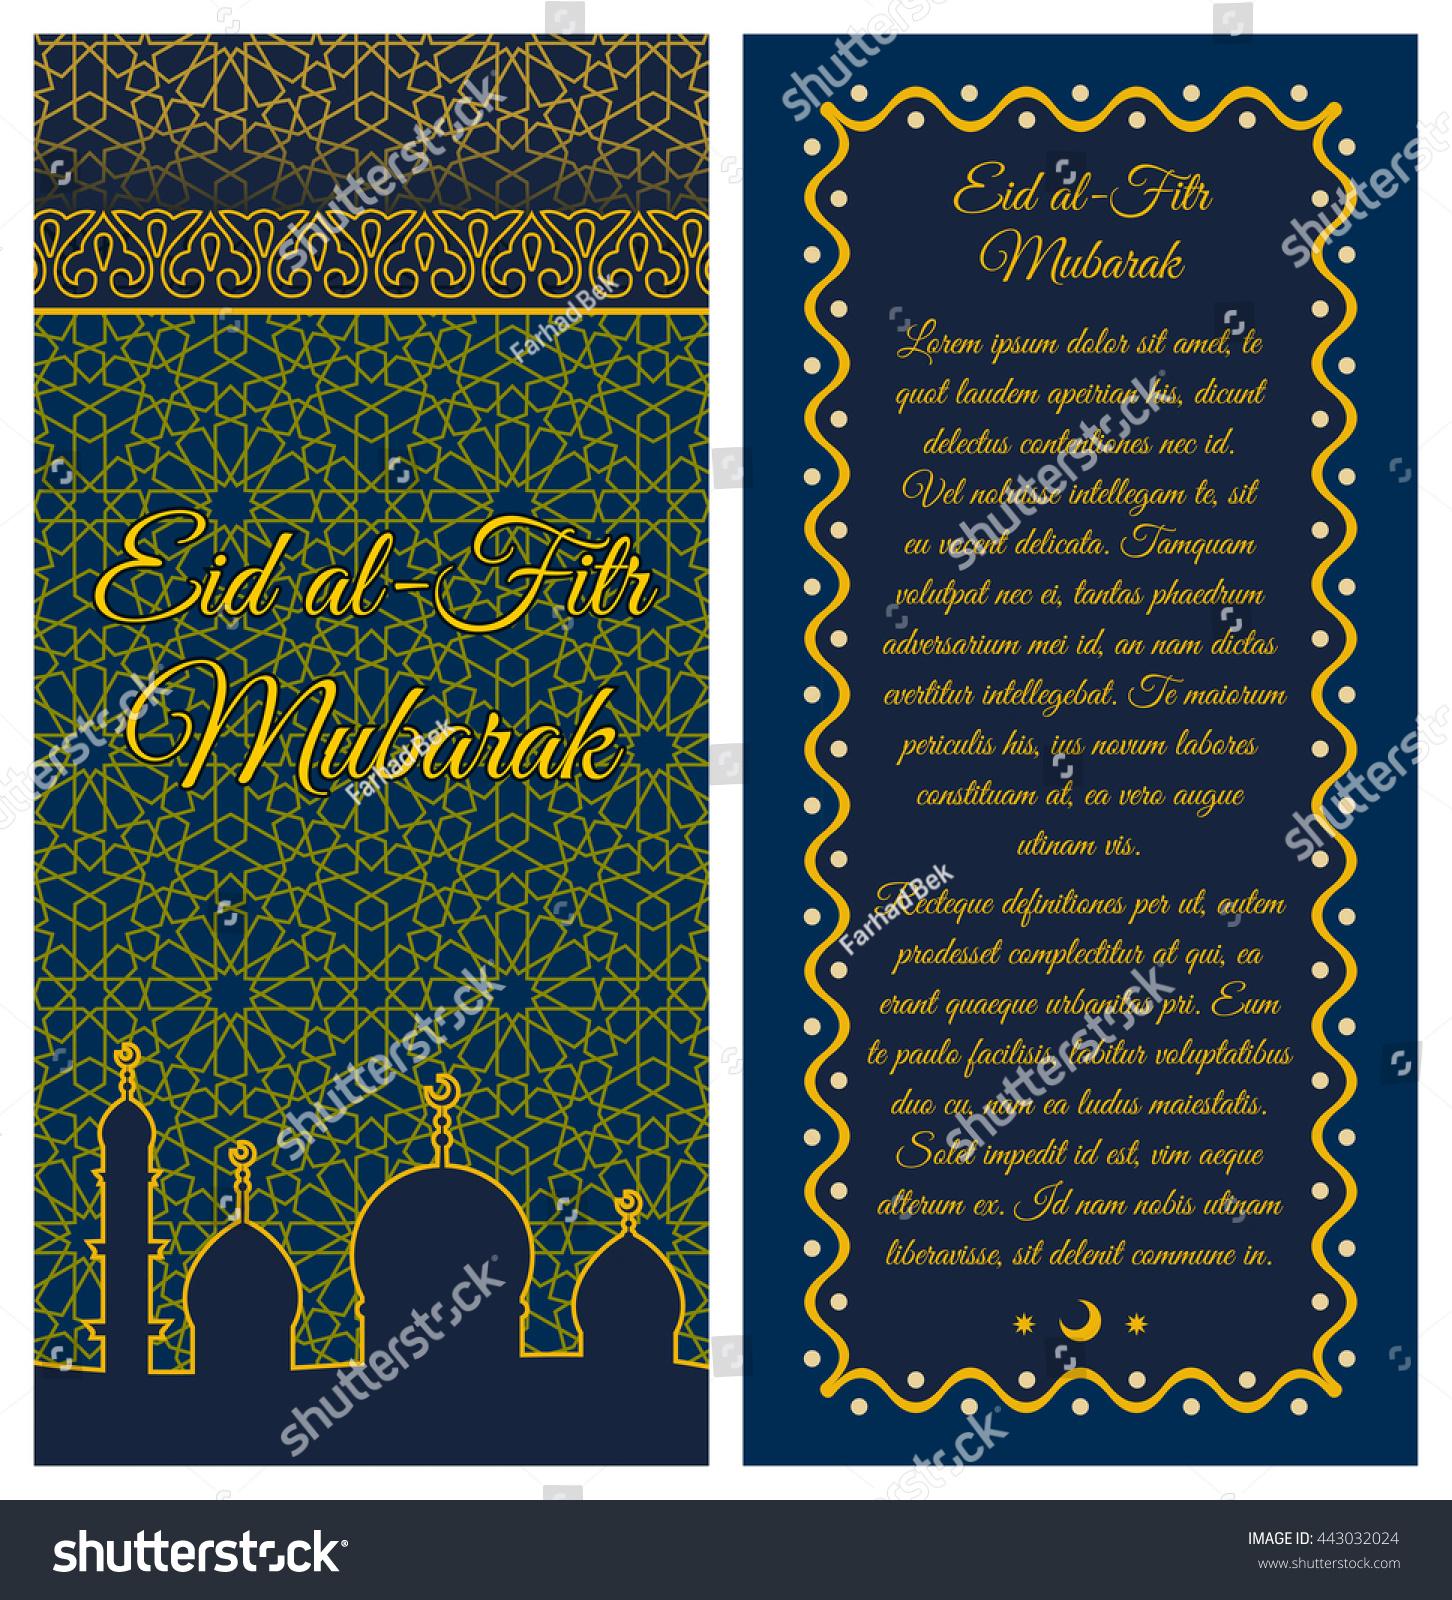 Cool Display Eid Al-Fitr Decorations - stock-vector-eid-al-fitr-mubarak-vintage-islamic-style-flyer-design-template-with-creative-art-elements-and-443032024  Snapshot_579425 .jpg